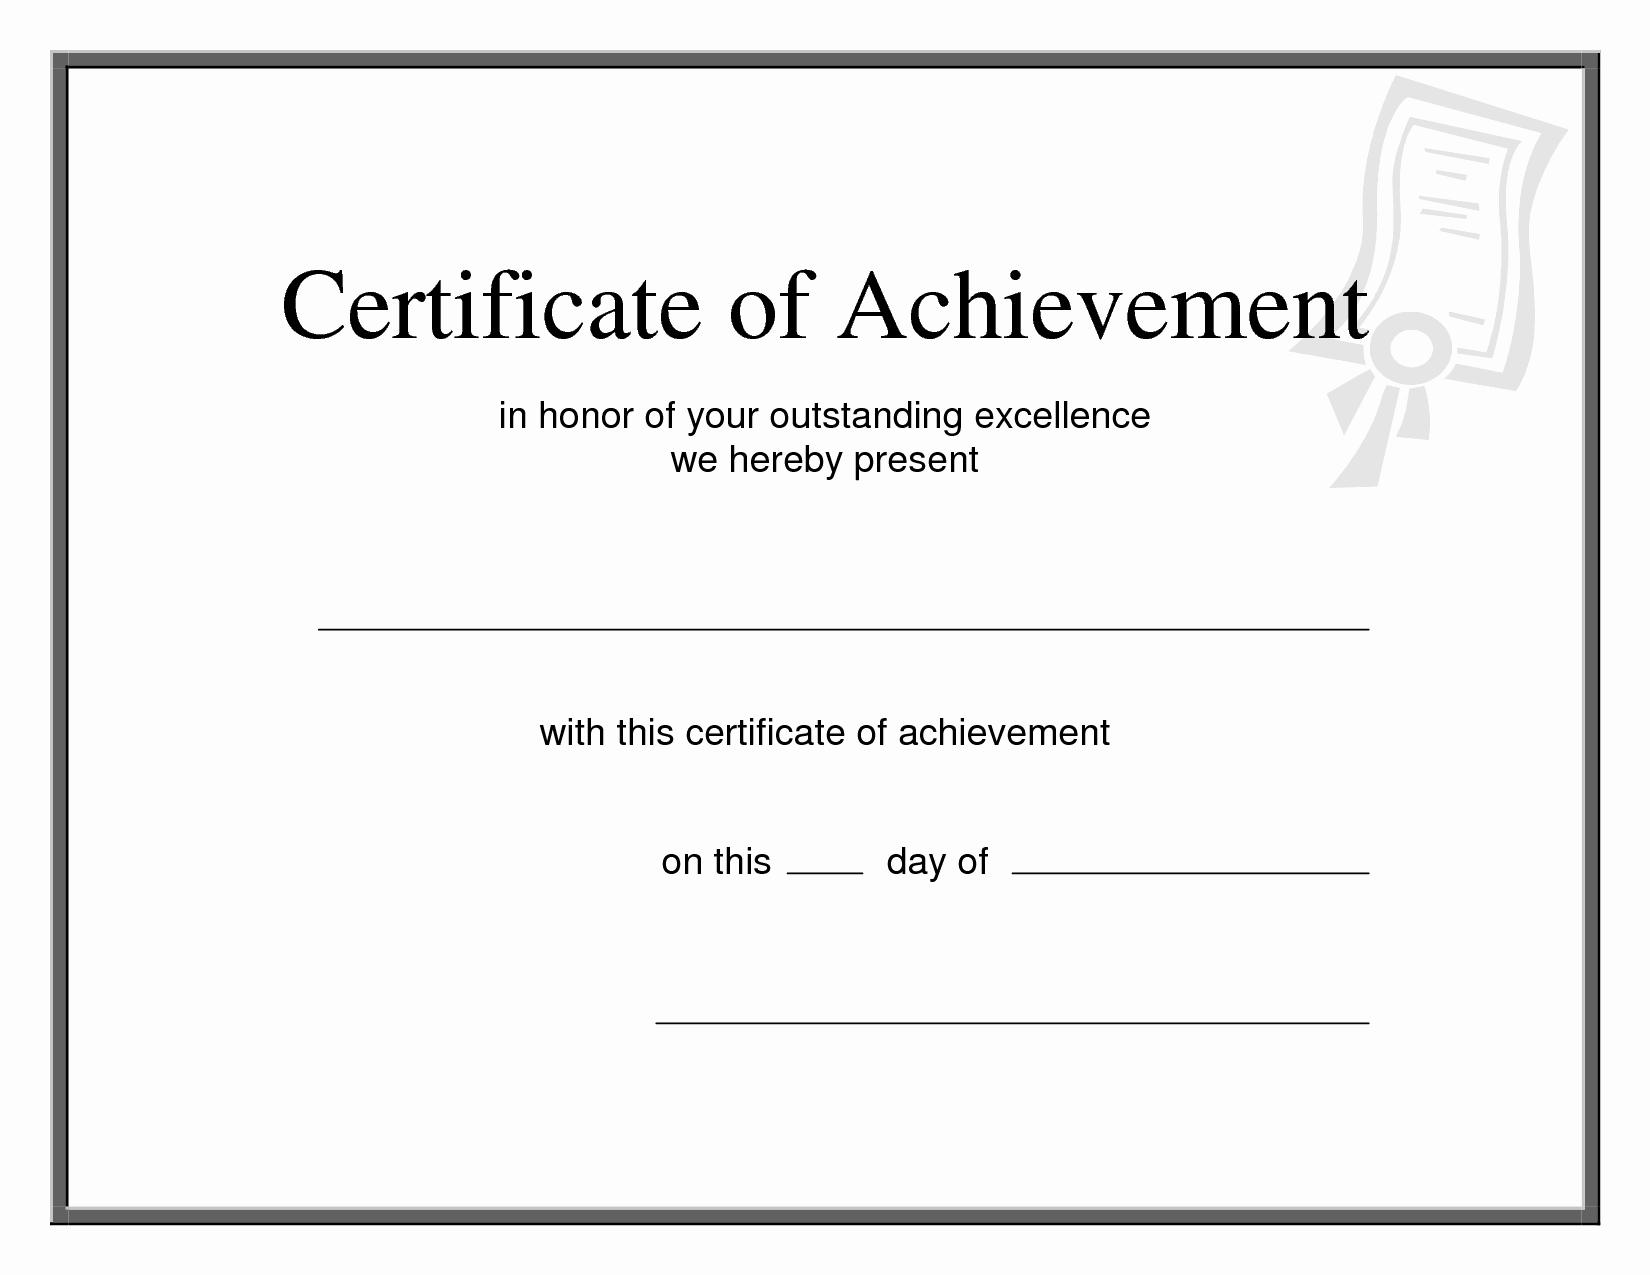 Certificate Of Achievement Free Template Awesome Army Certificate Achievement Template Example Mughals